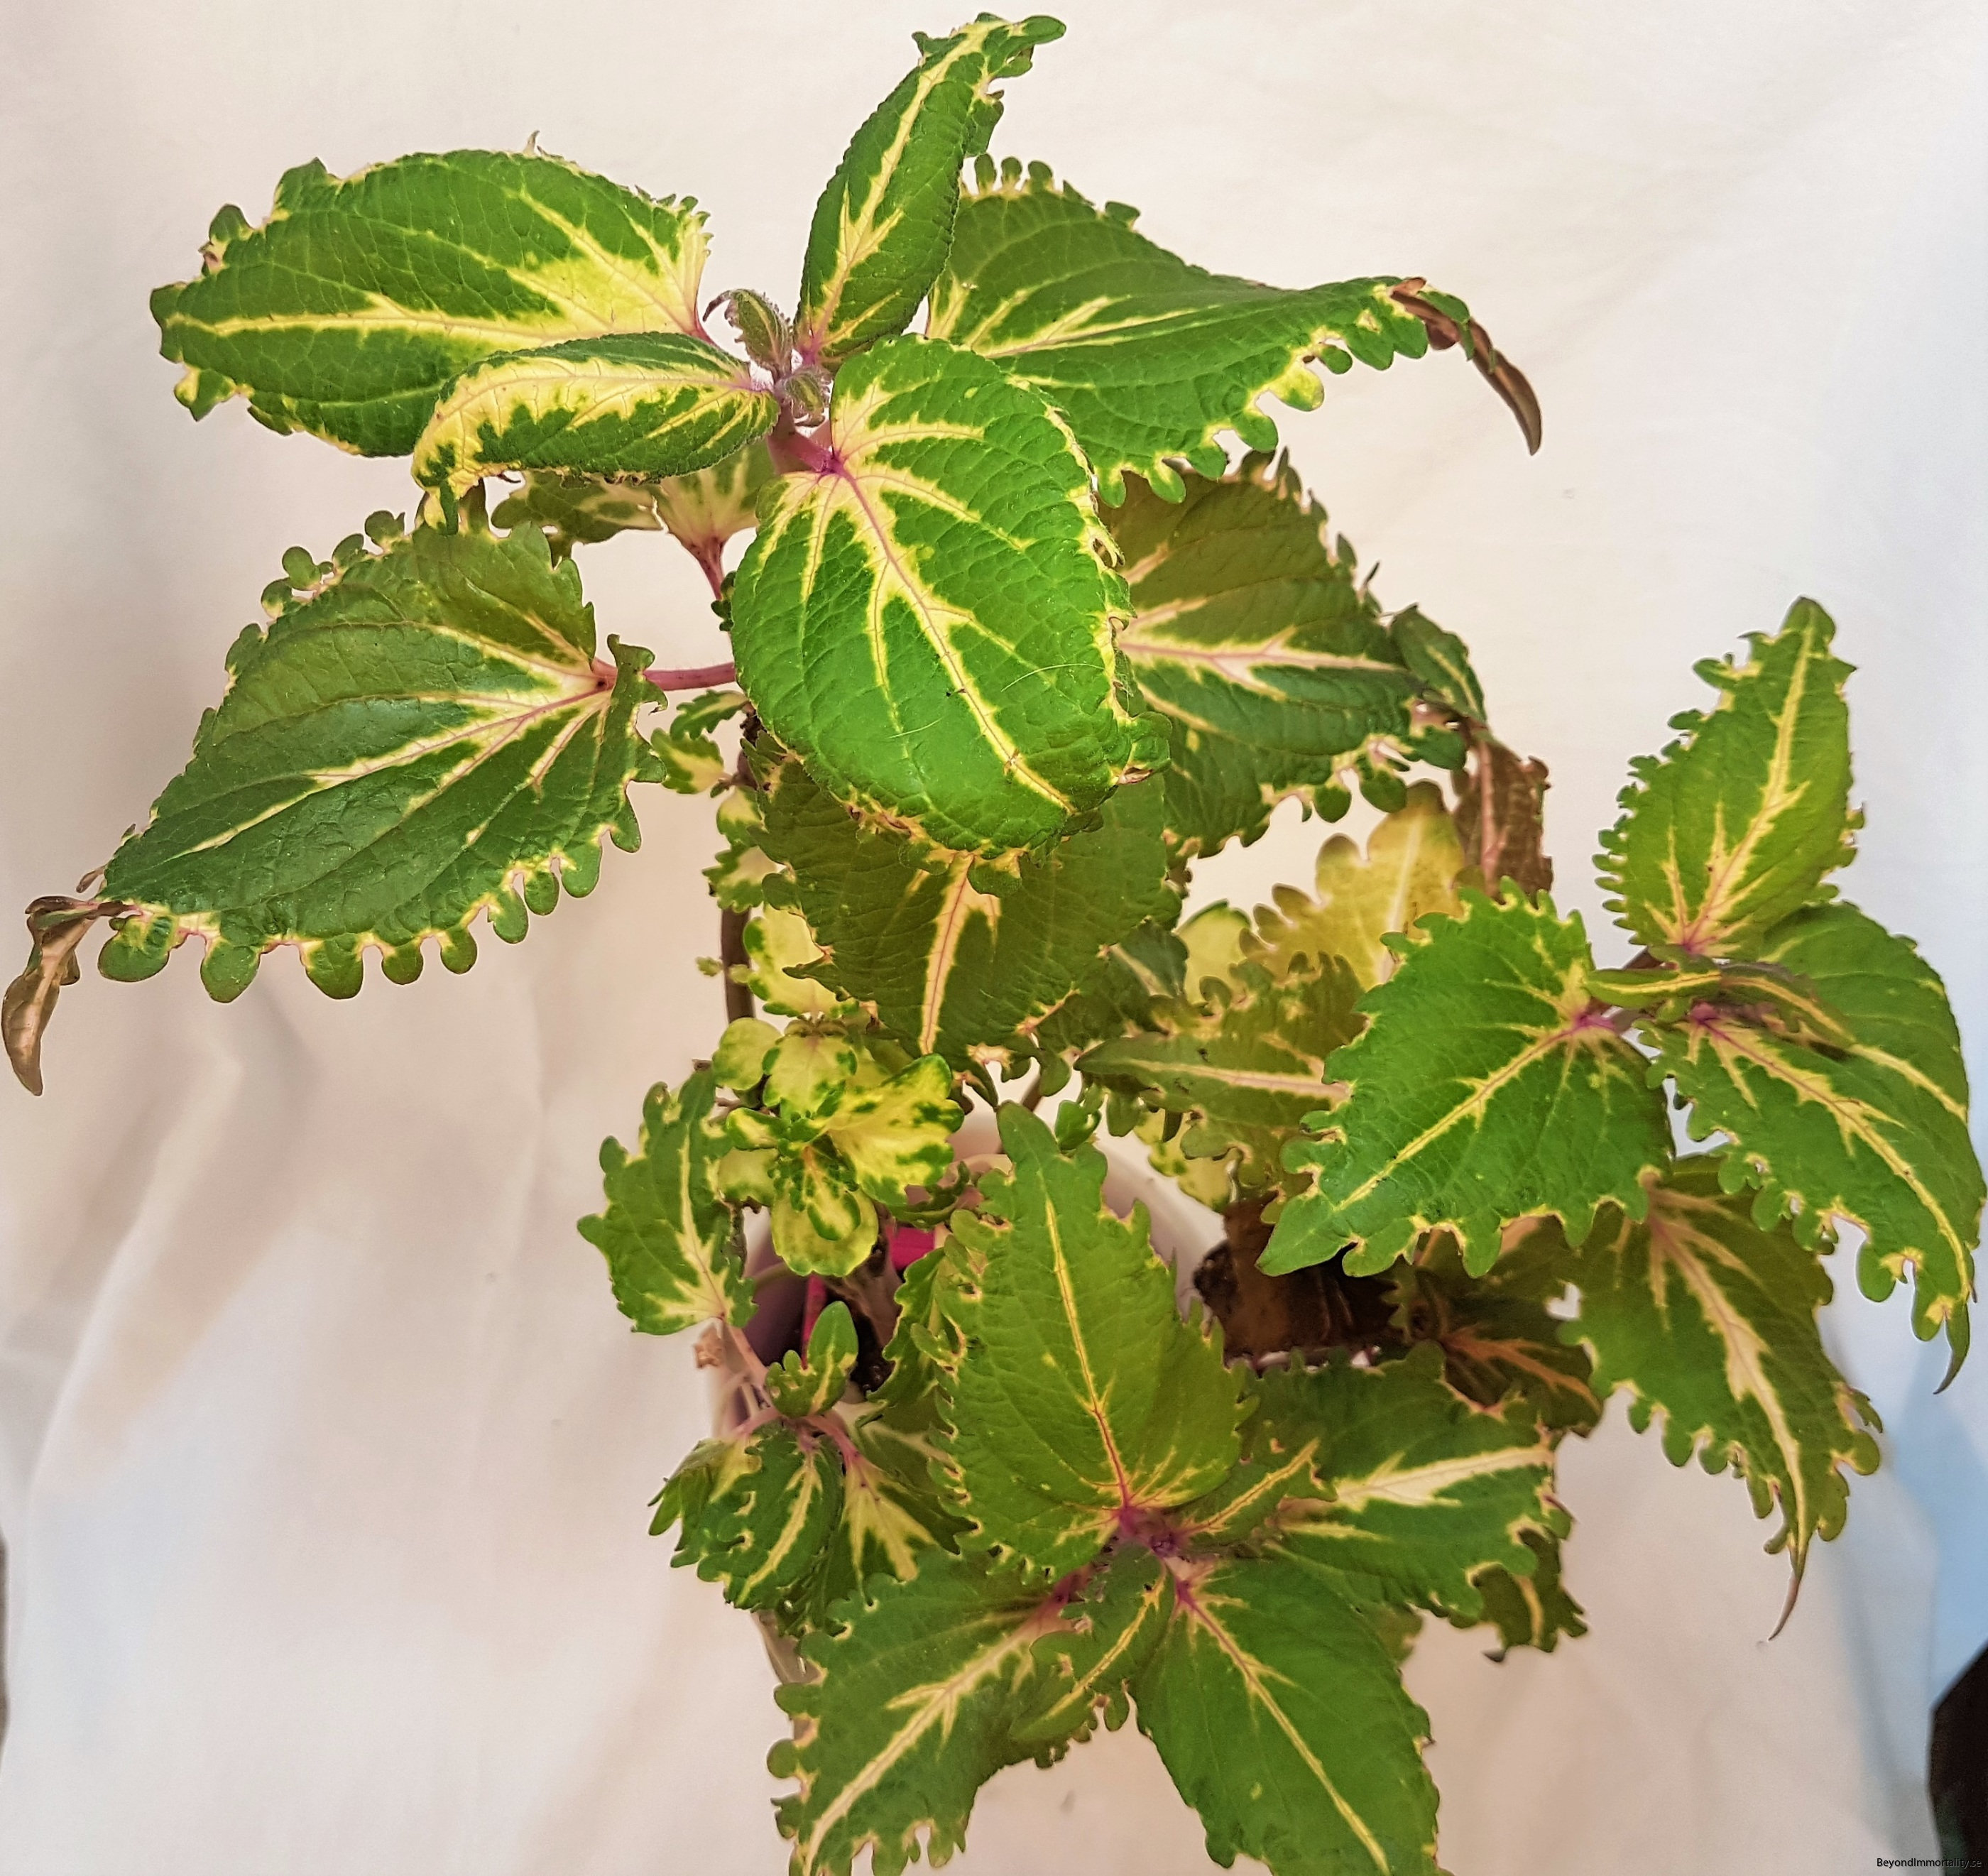 coleen stor palettblad coleus